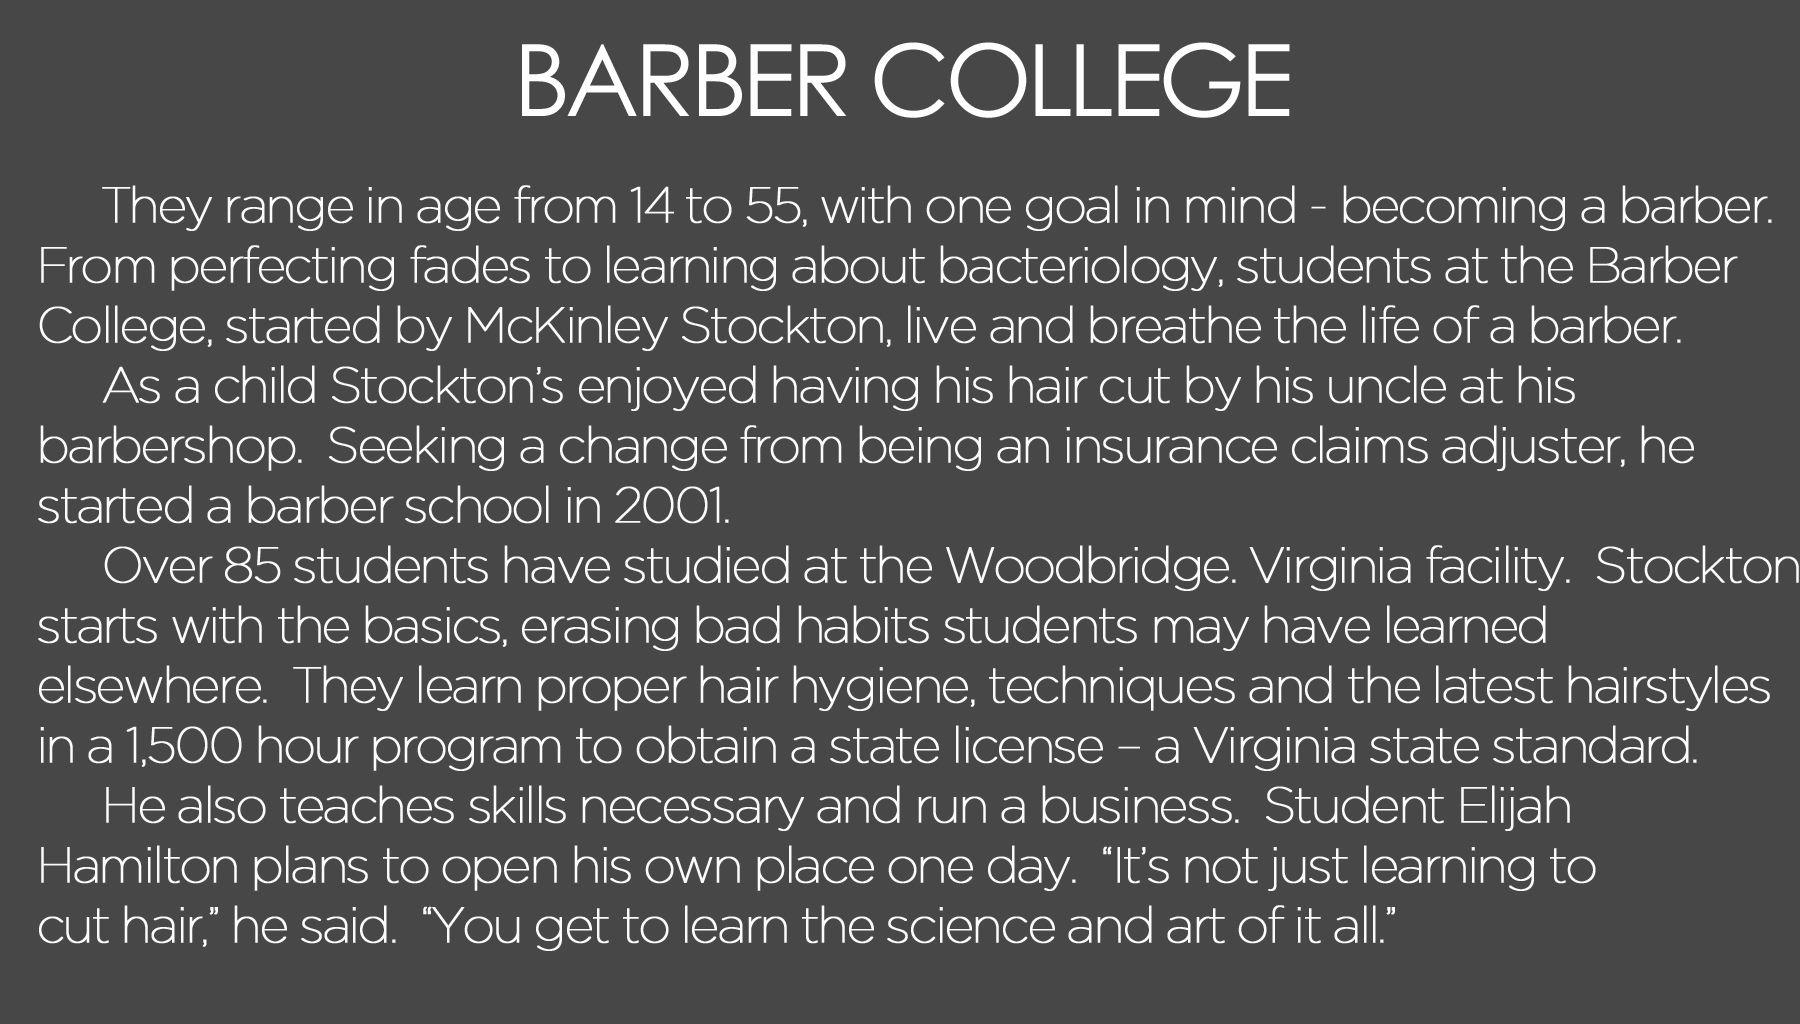 11-barber_college01lb